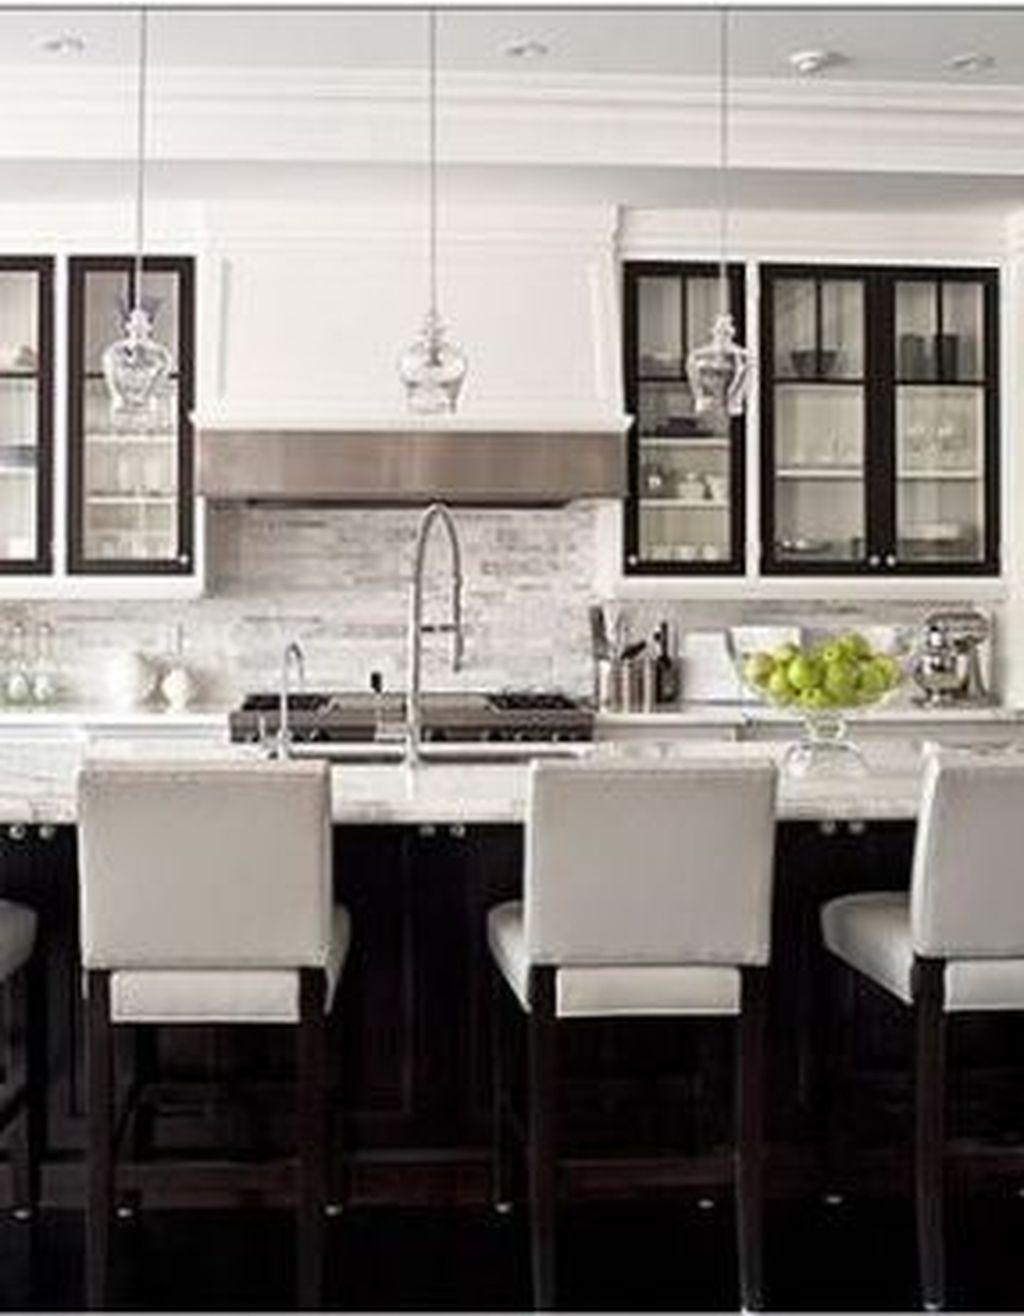 30 Elegant Black And White Kitchen Cabinets Design Ideas To Copy